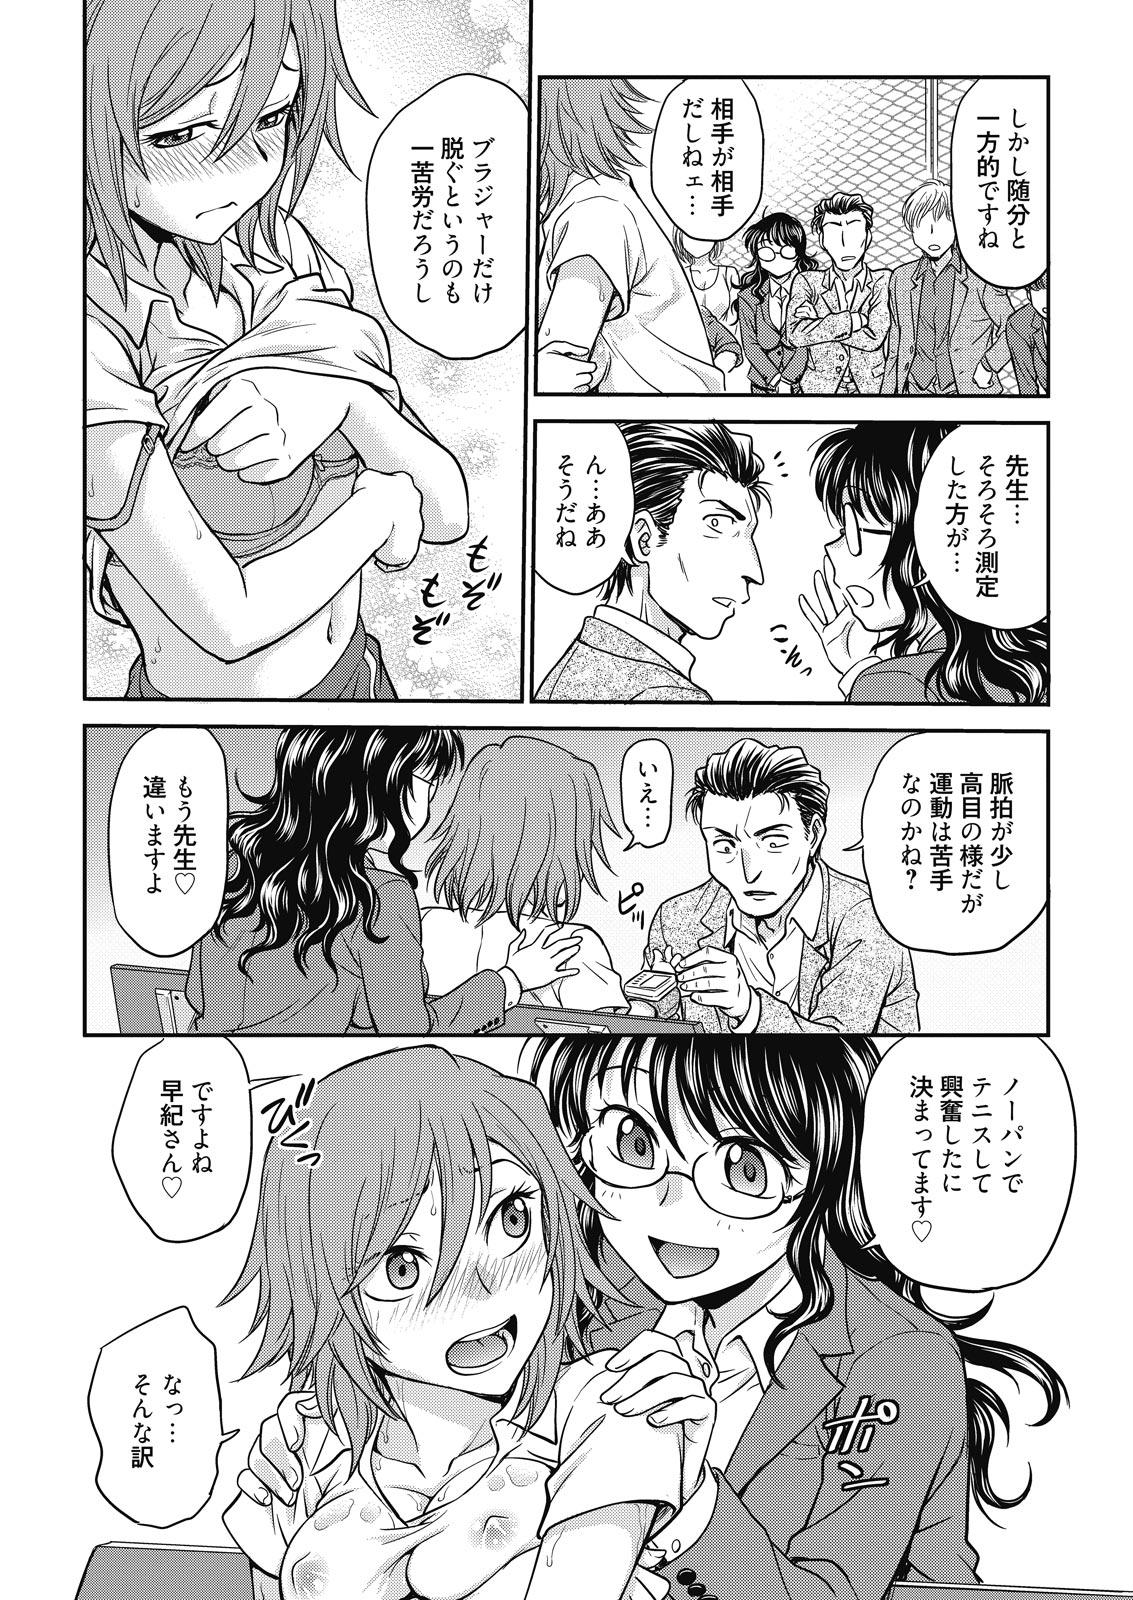 Web Manga Bangaichi Vol. 7 73